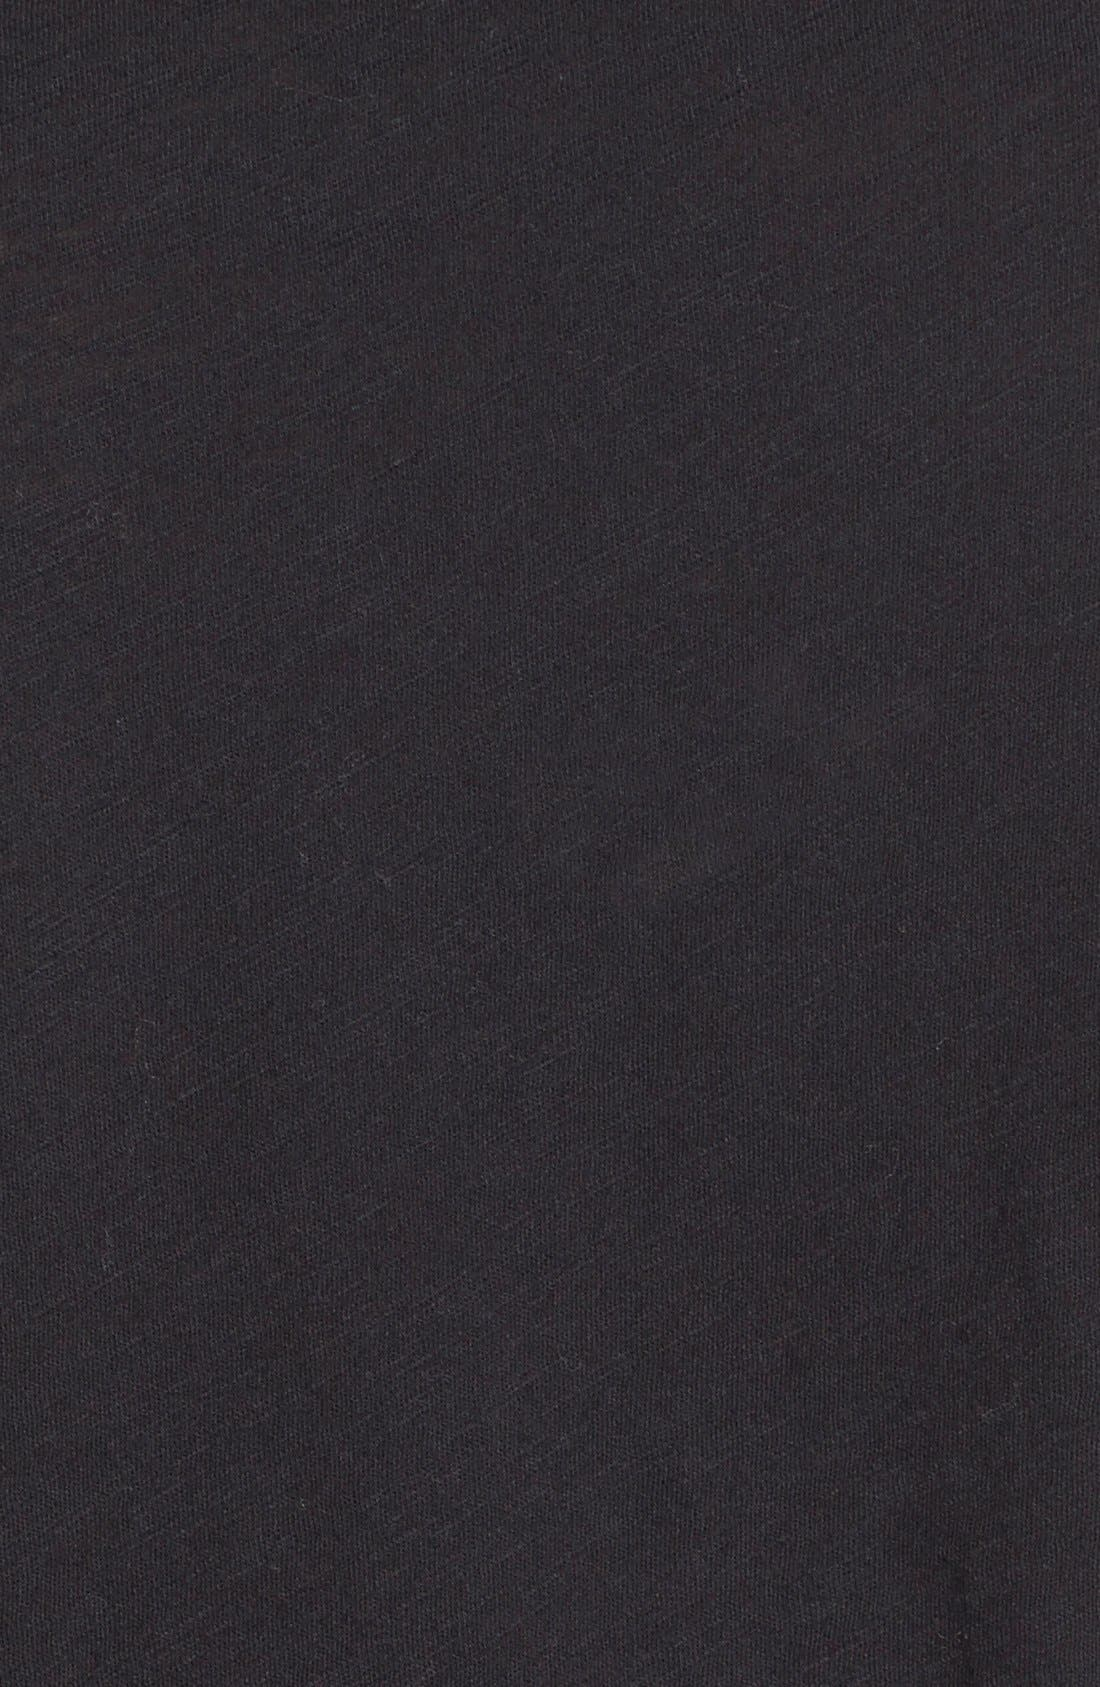 Alternate Image 5  - Madewell 'Whisper' Cotton Crewneck Tee